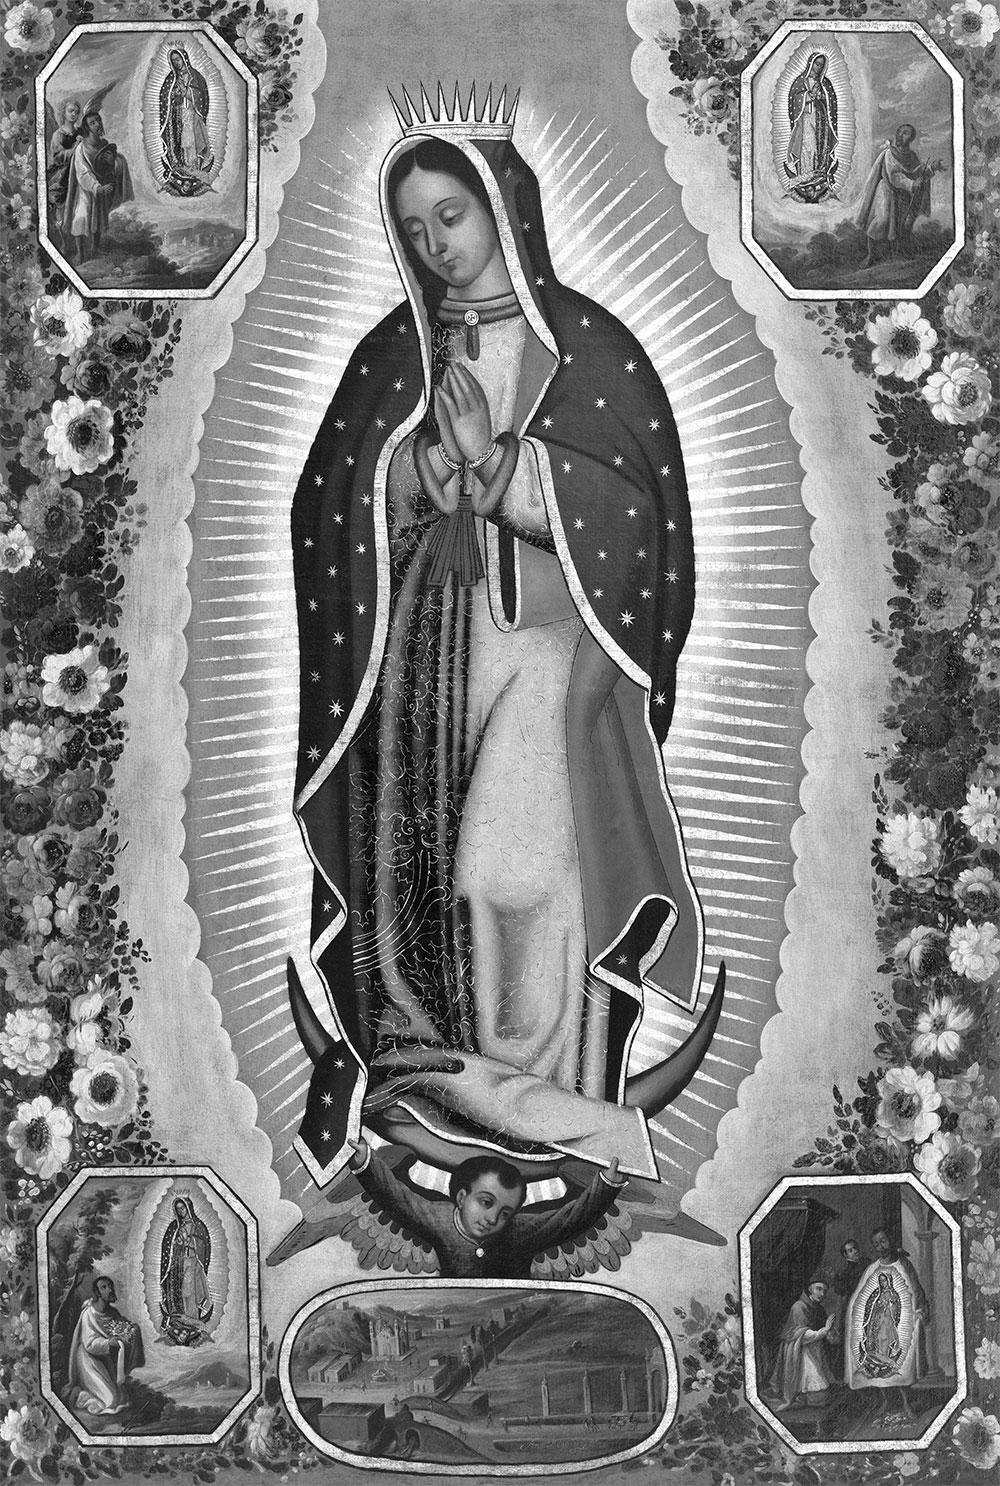 Virgin of Guadalupe (Virgen de Guadalupe)